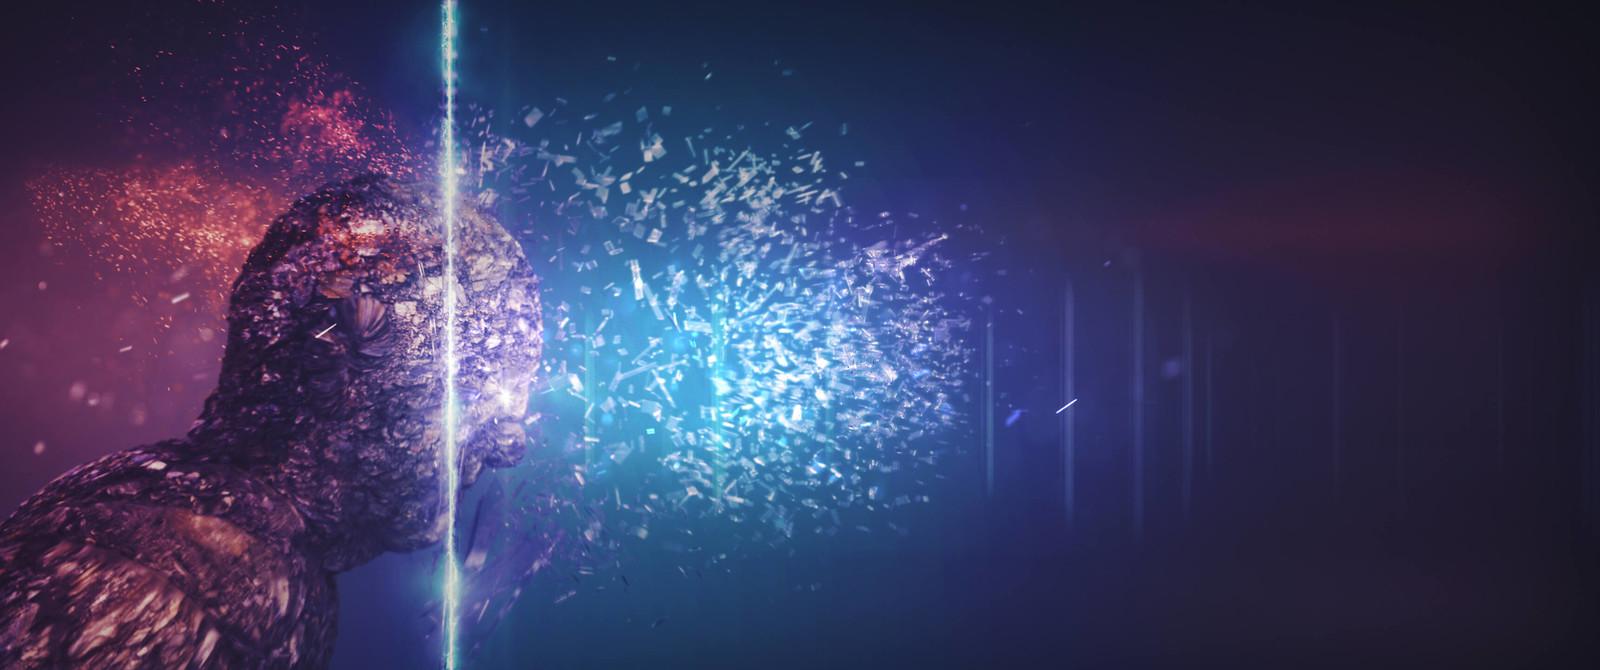 Rockhead breaks the dimension